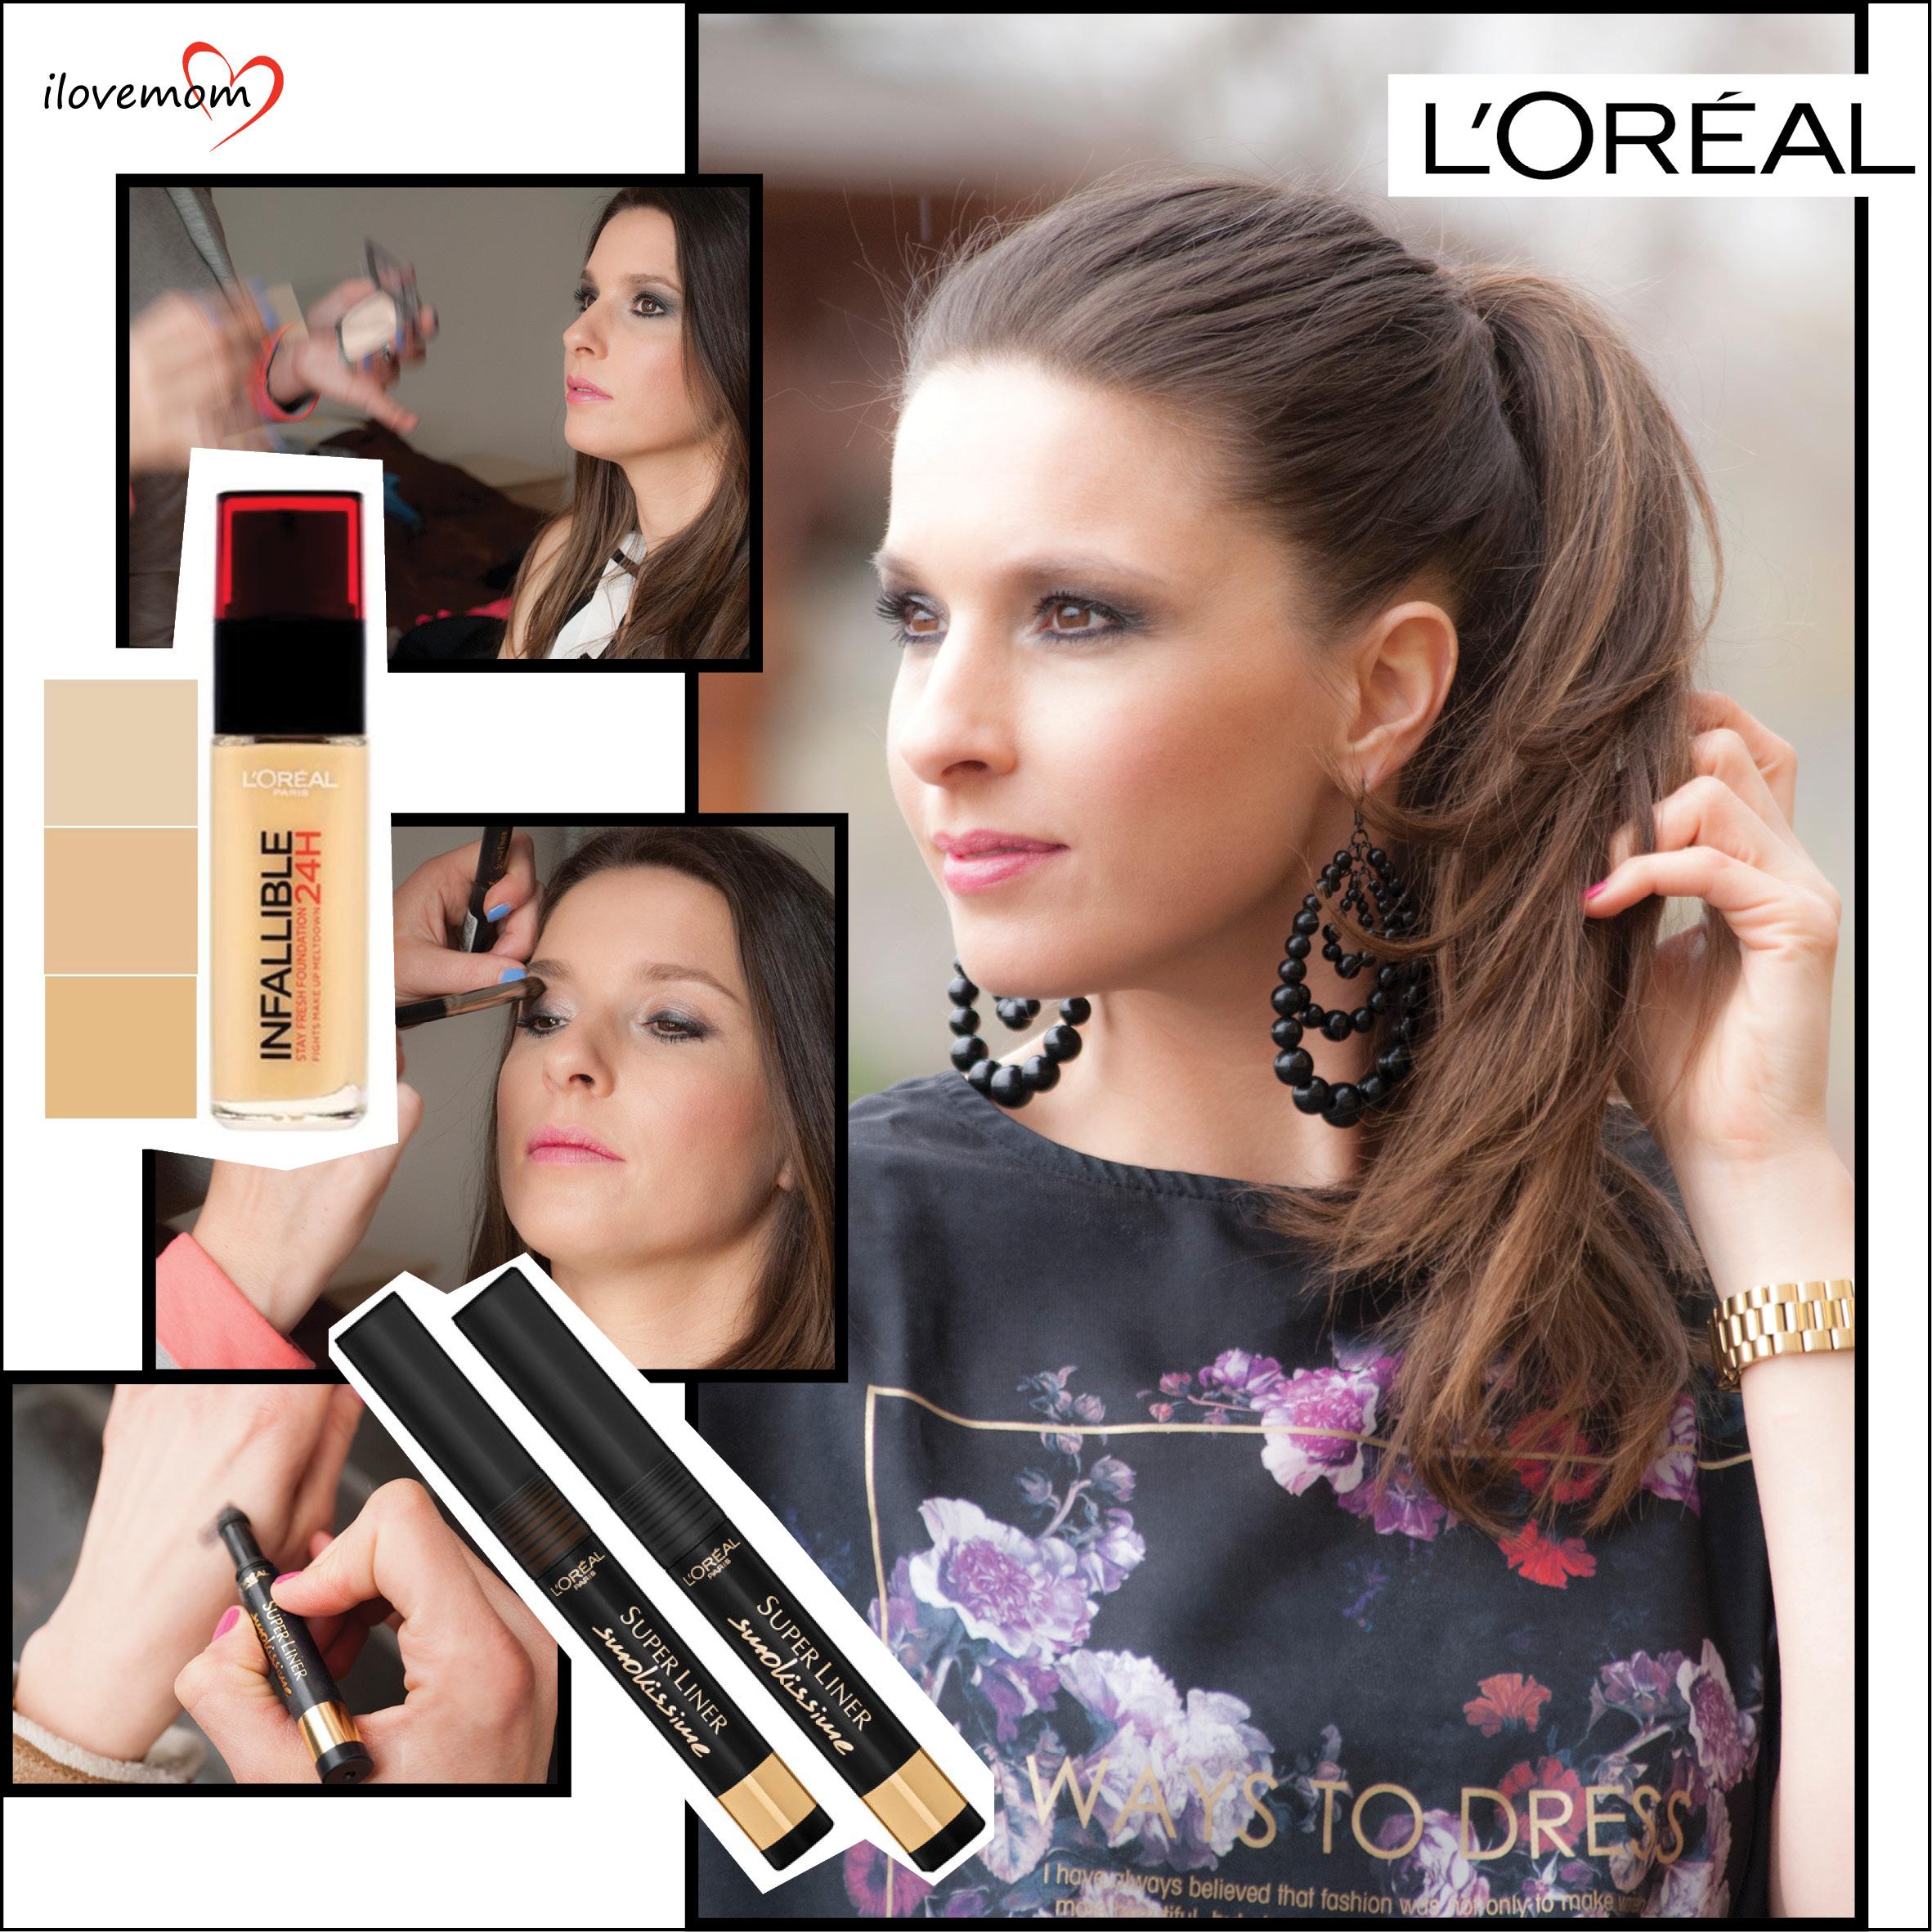 ilovemom_loreal_smink_2.jpg